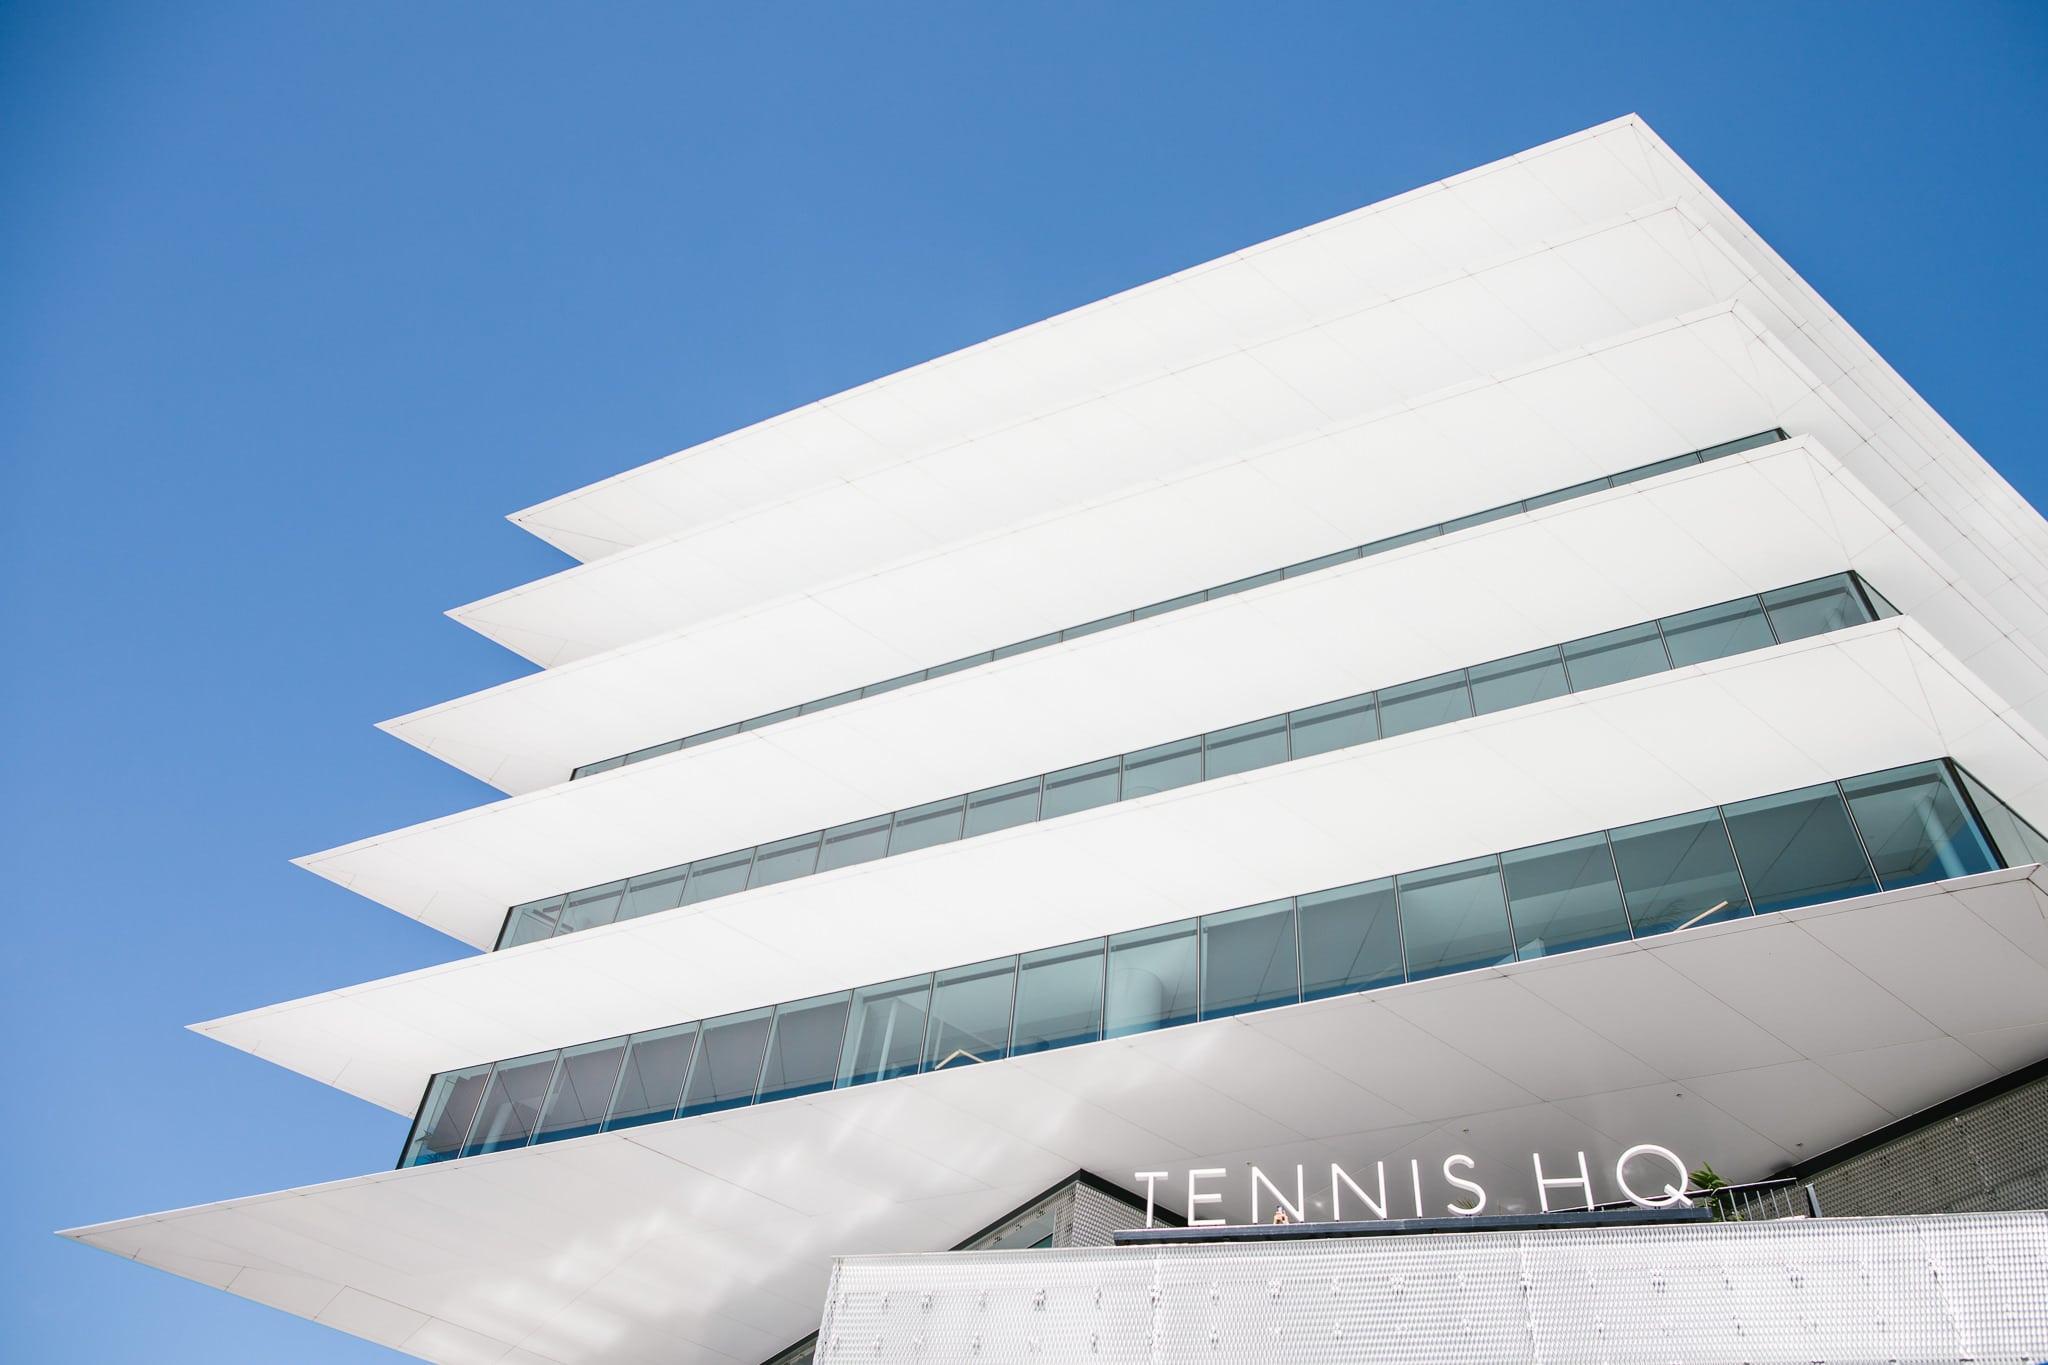 architecture - tennis HQ